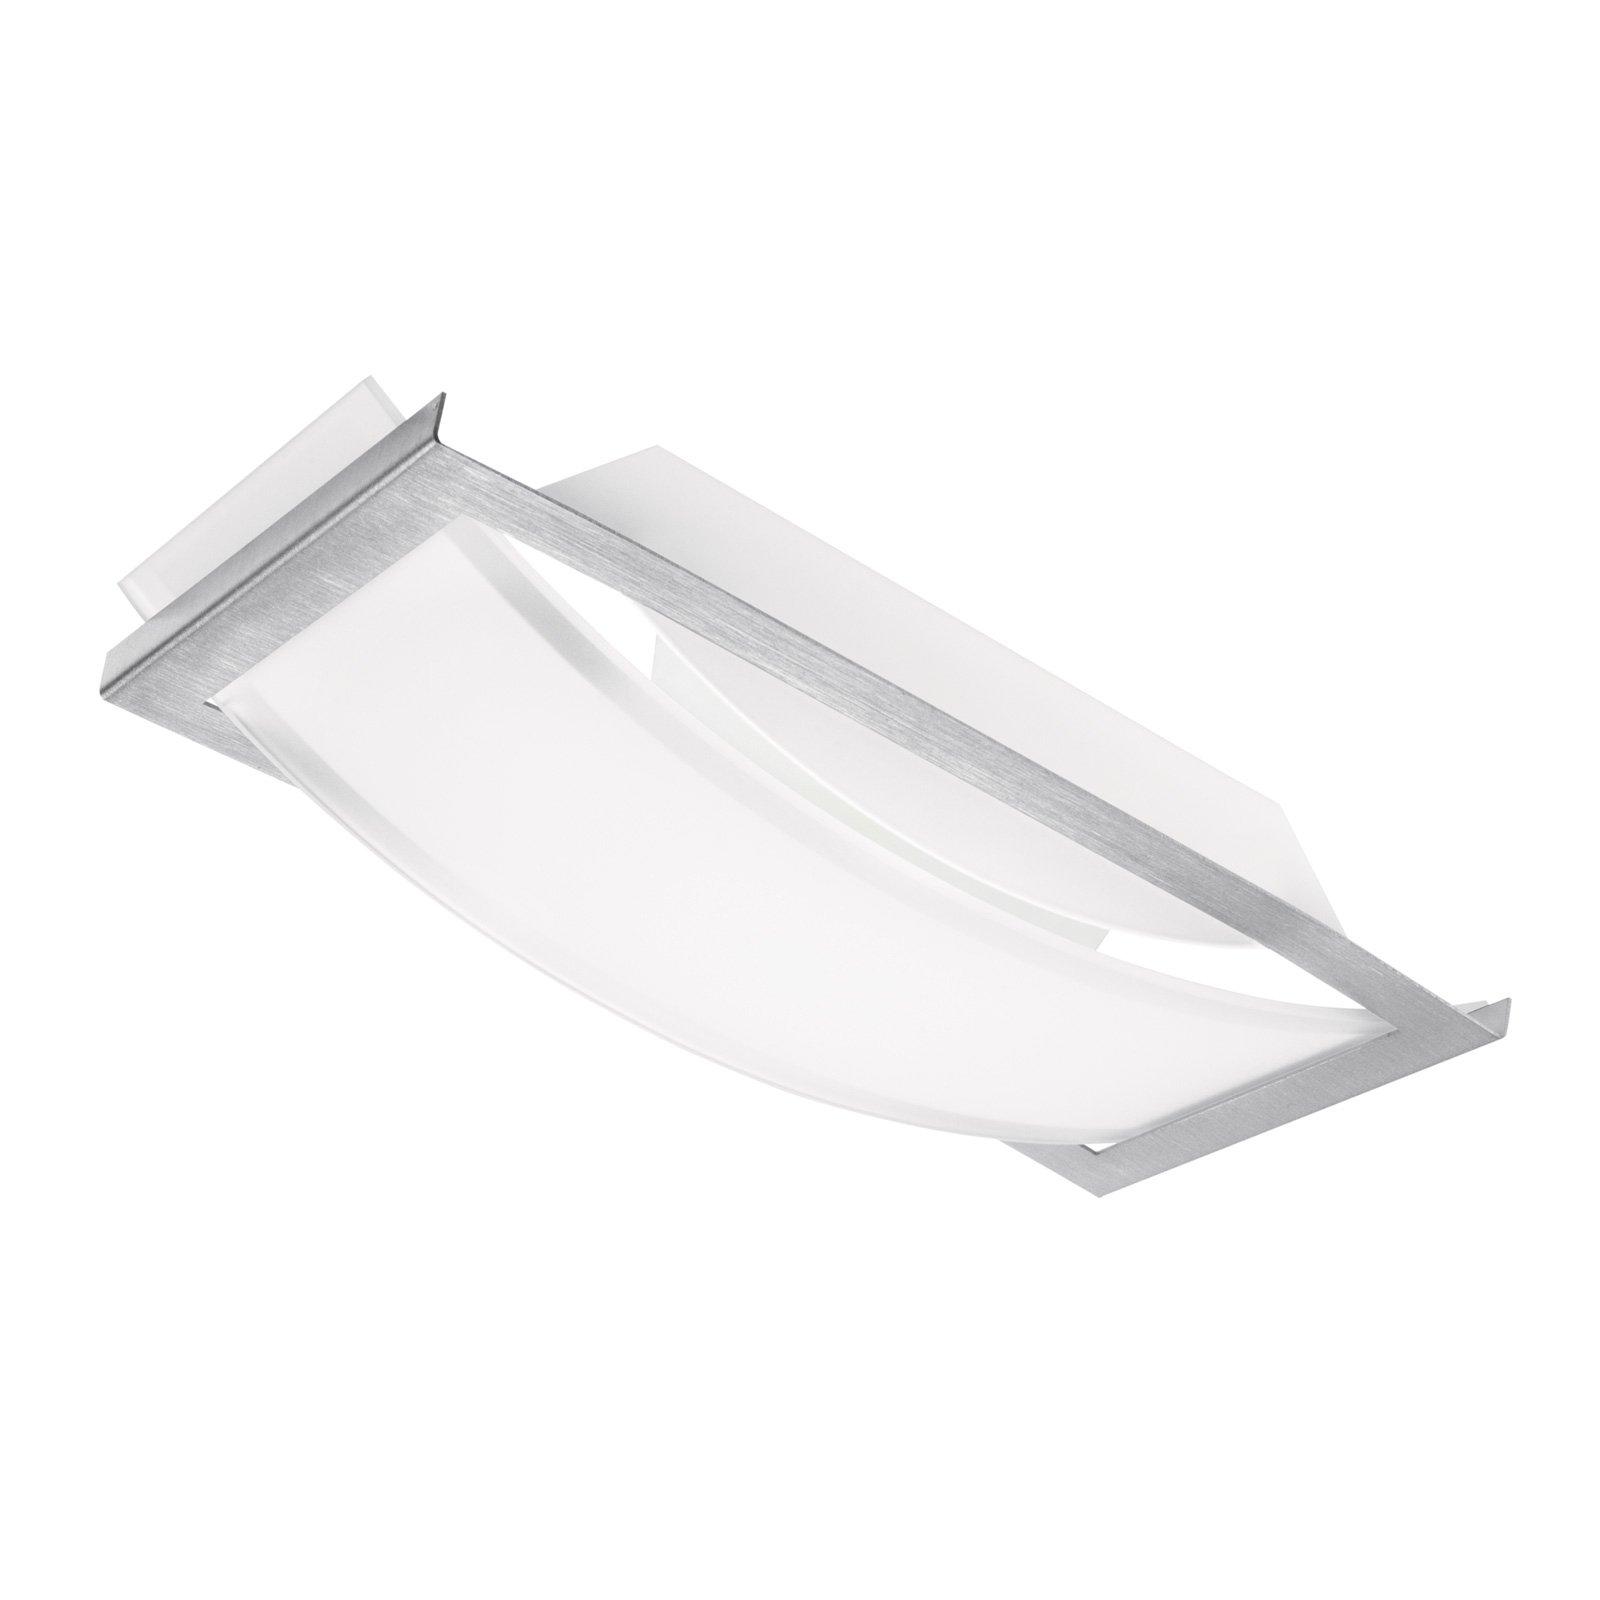 LEDVANCE Lunive Arc LED-taklampe 27x12 4 000 K